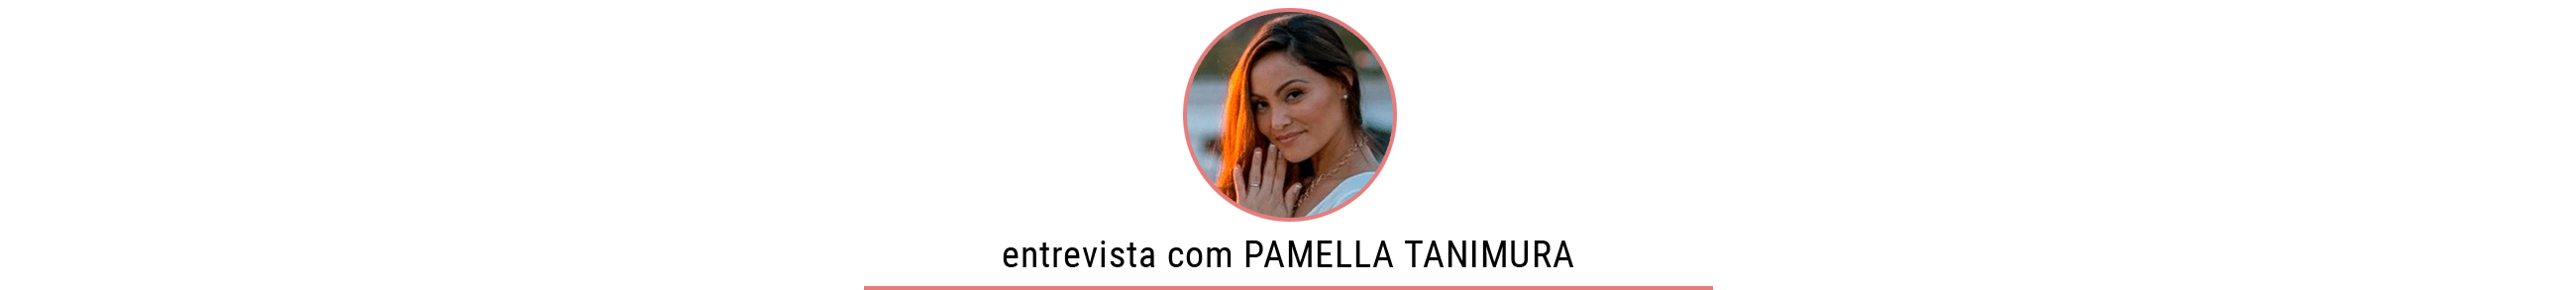 Aromaterapia com Pamella Tanimura